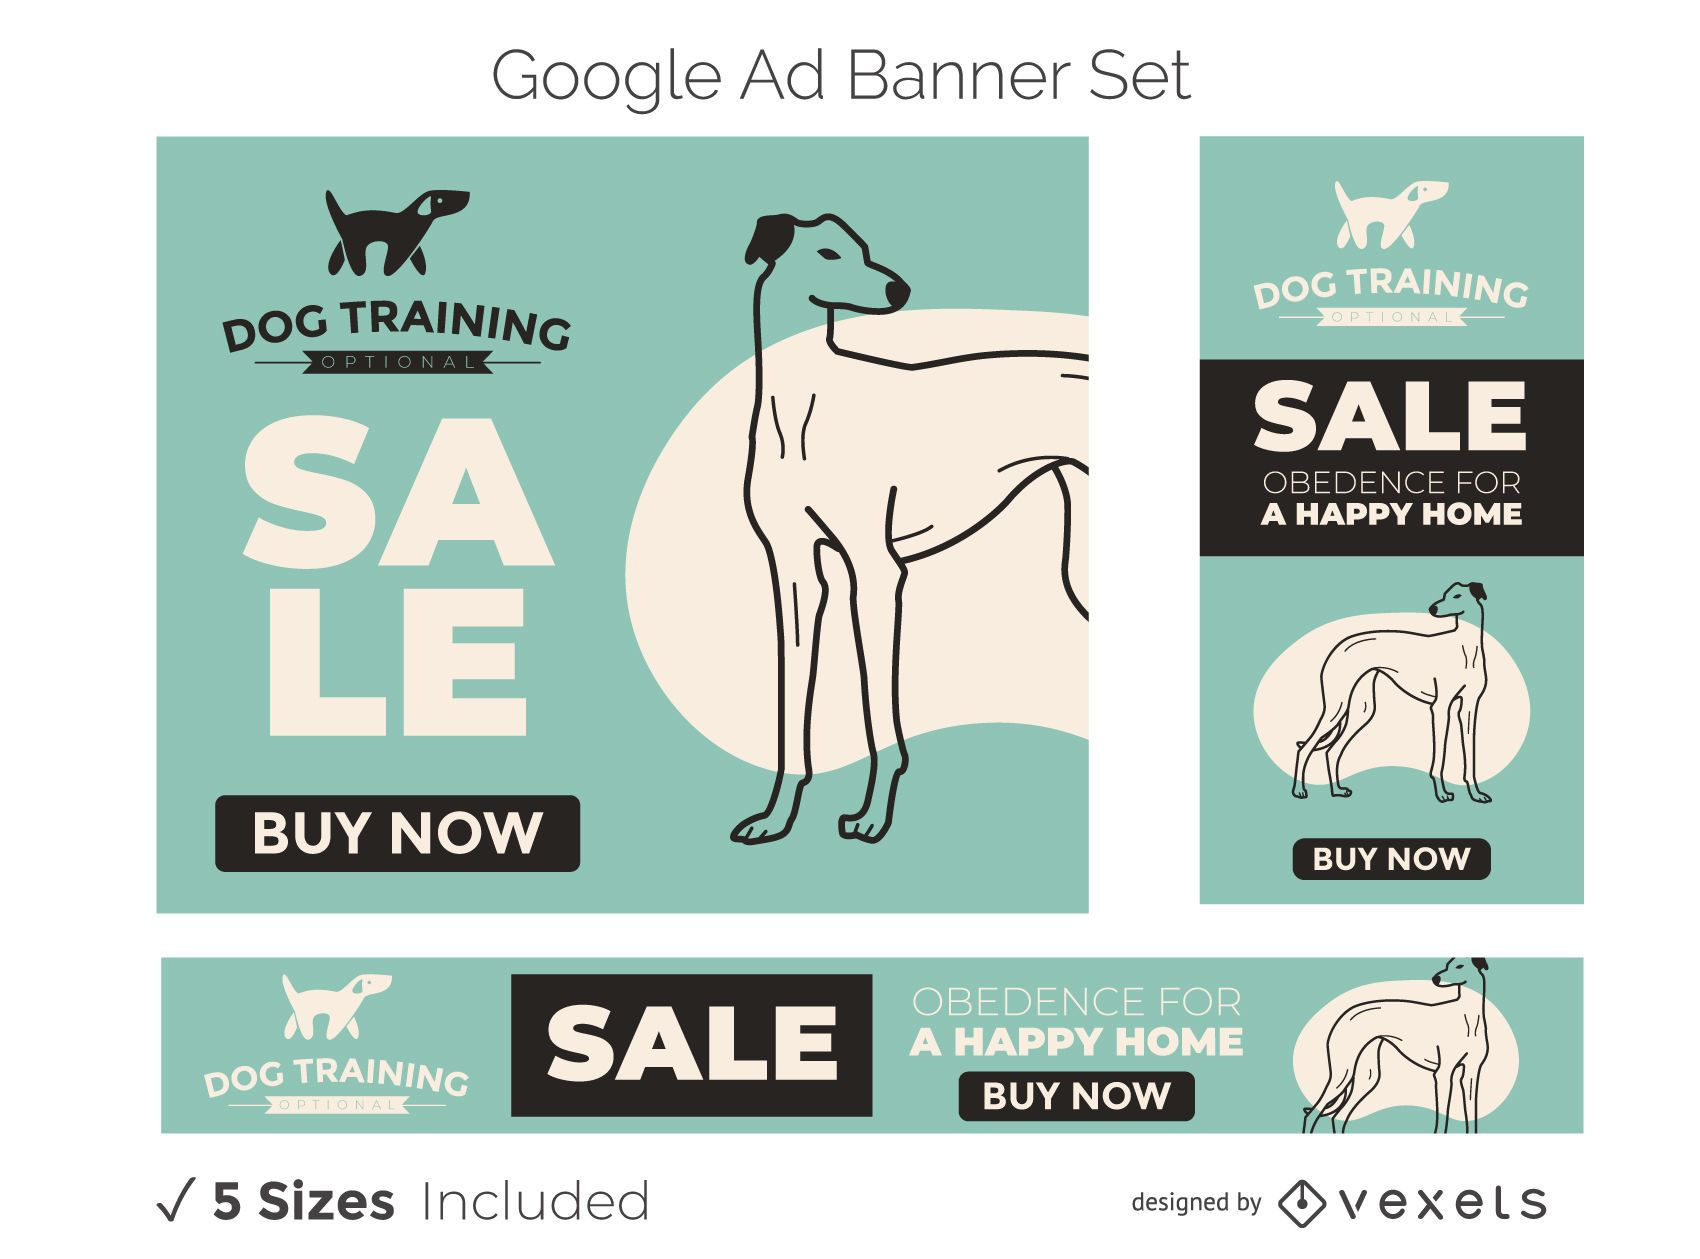 Dog Training Google Ads Banner Set